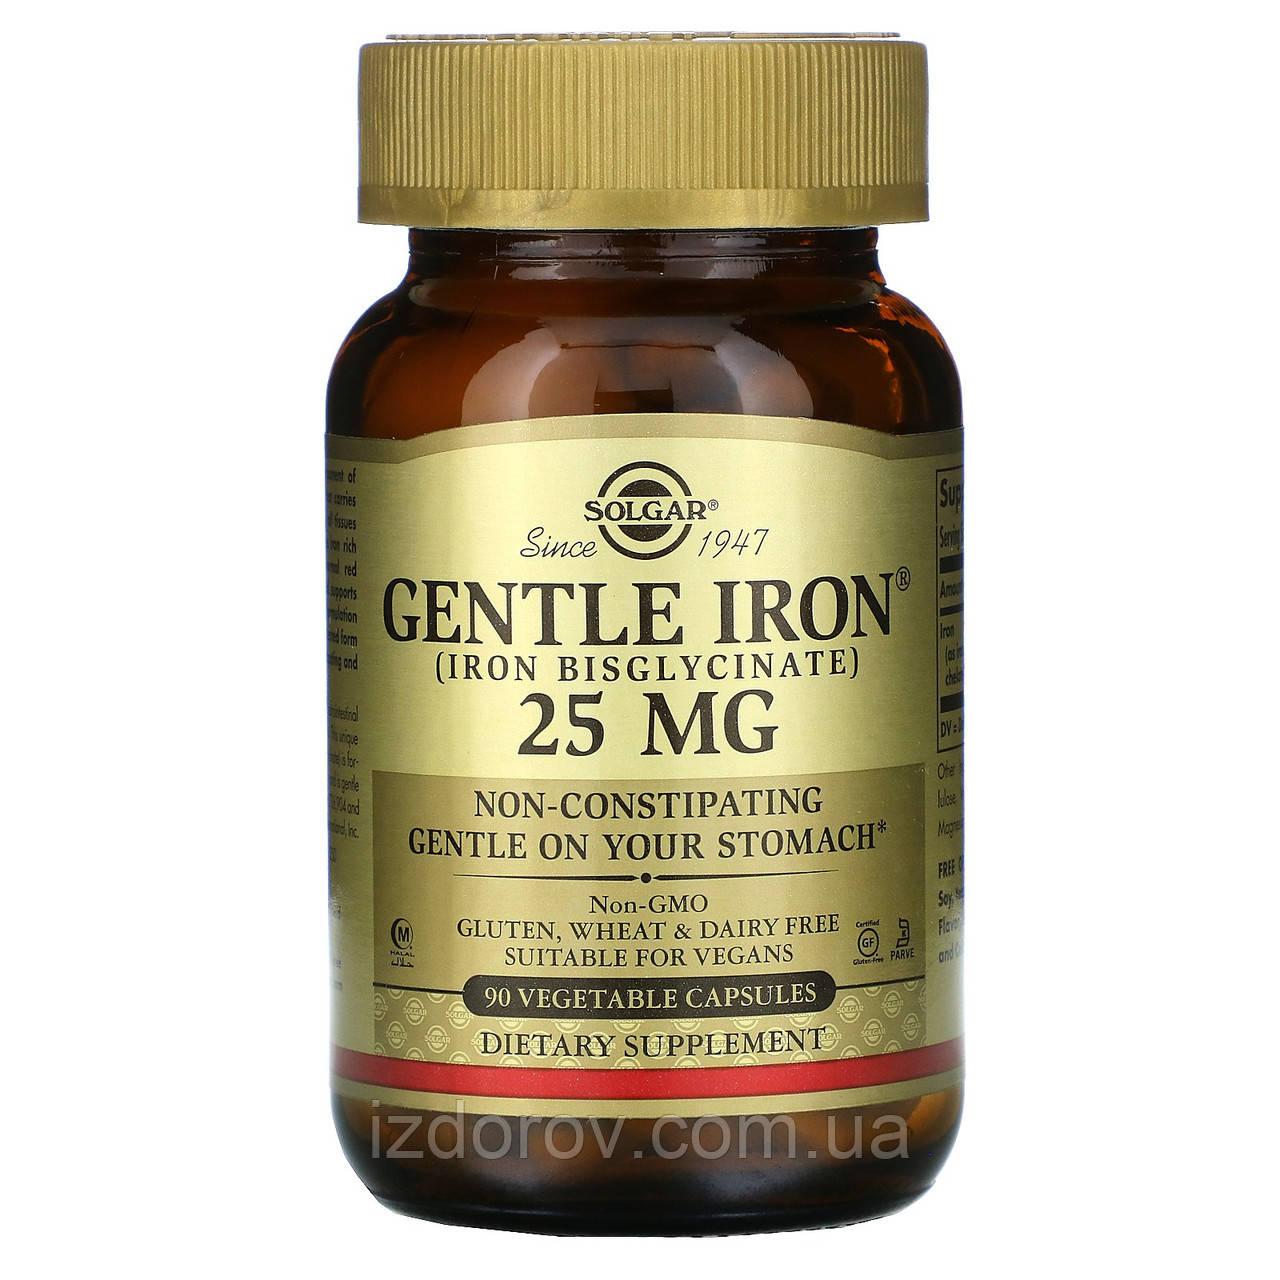 Solgar, Мягкое железо 25 мг, Gentle Iron, 90 капсул